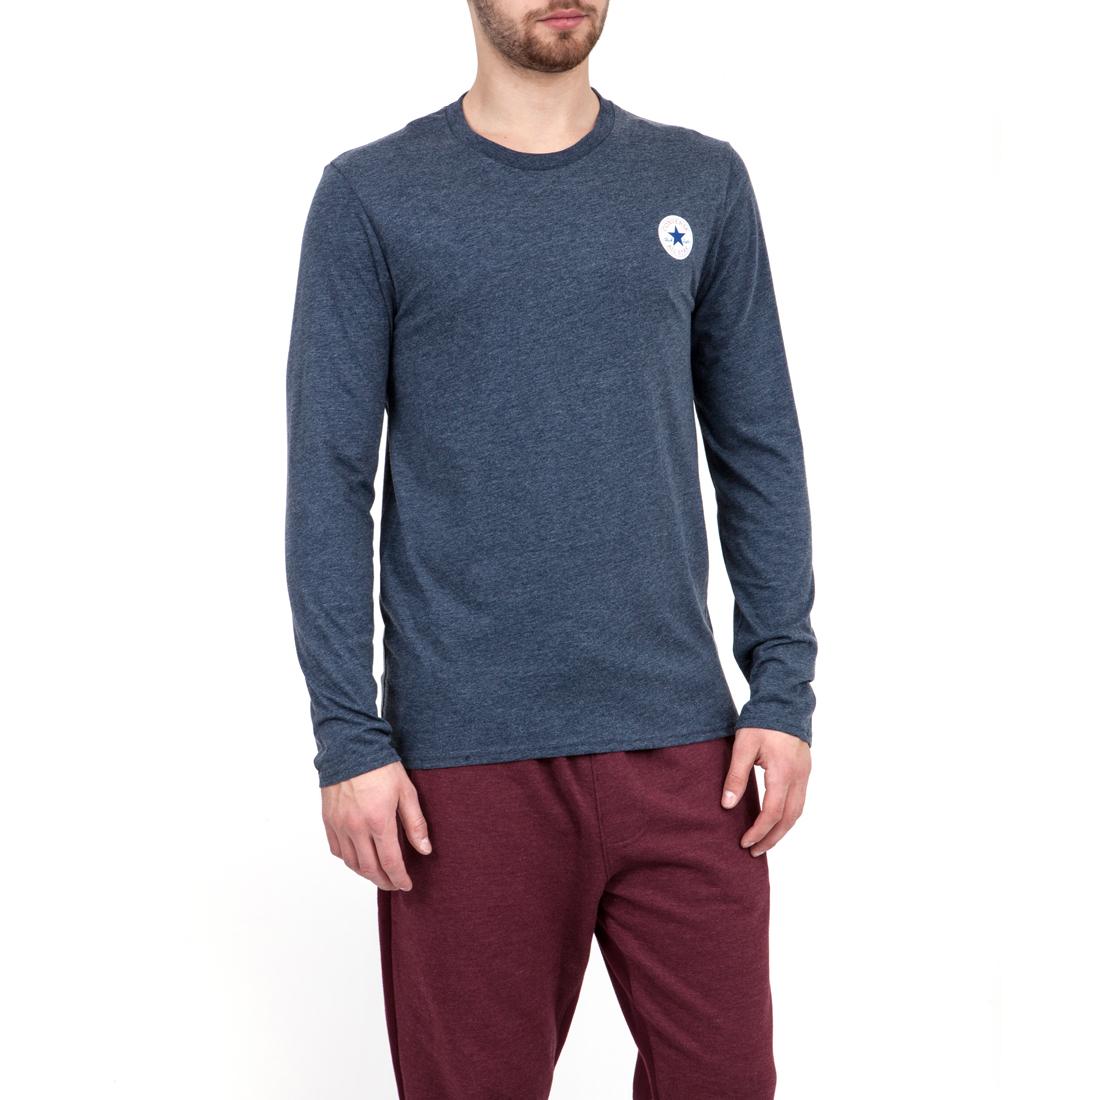 CONVERSE - Ανδρική μπλούζα Converse μπλε ανδρικά ρούχα αθλητικά φούτερ μακρυμάνικα